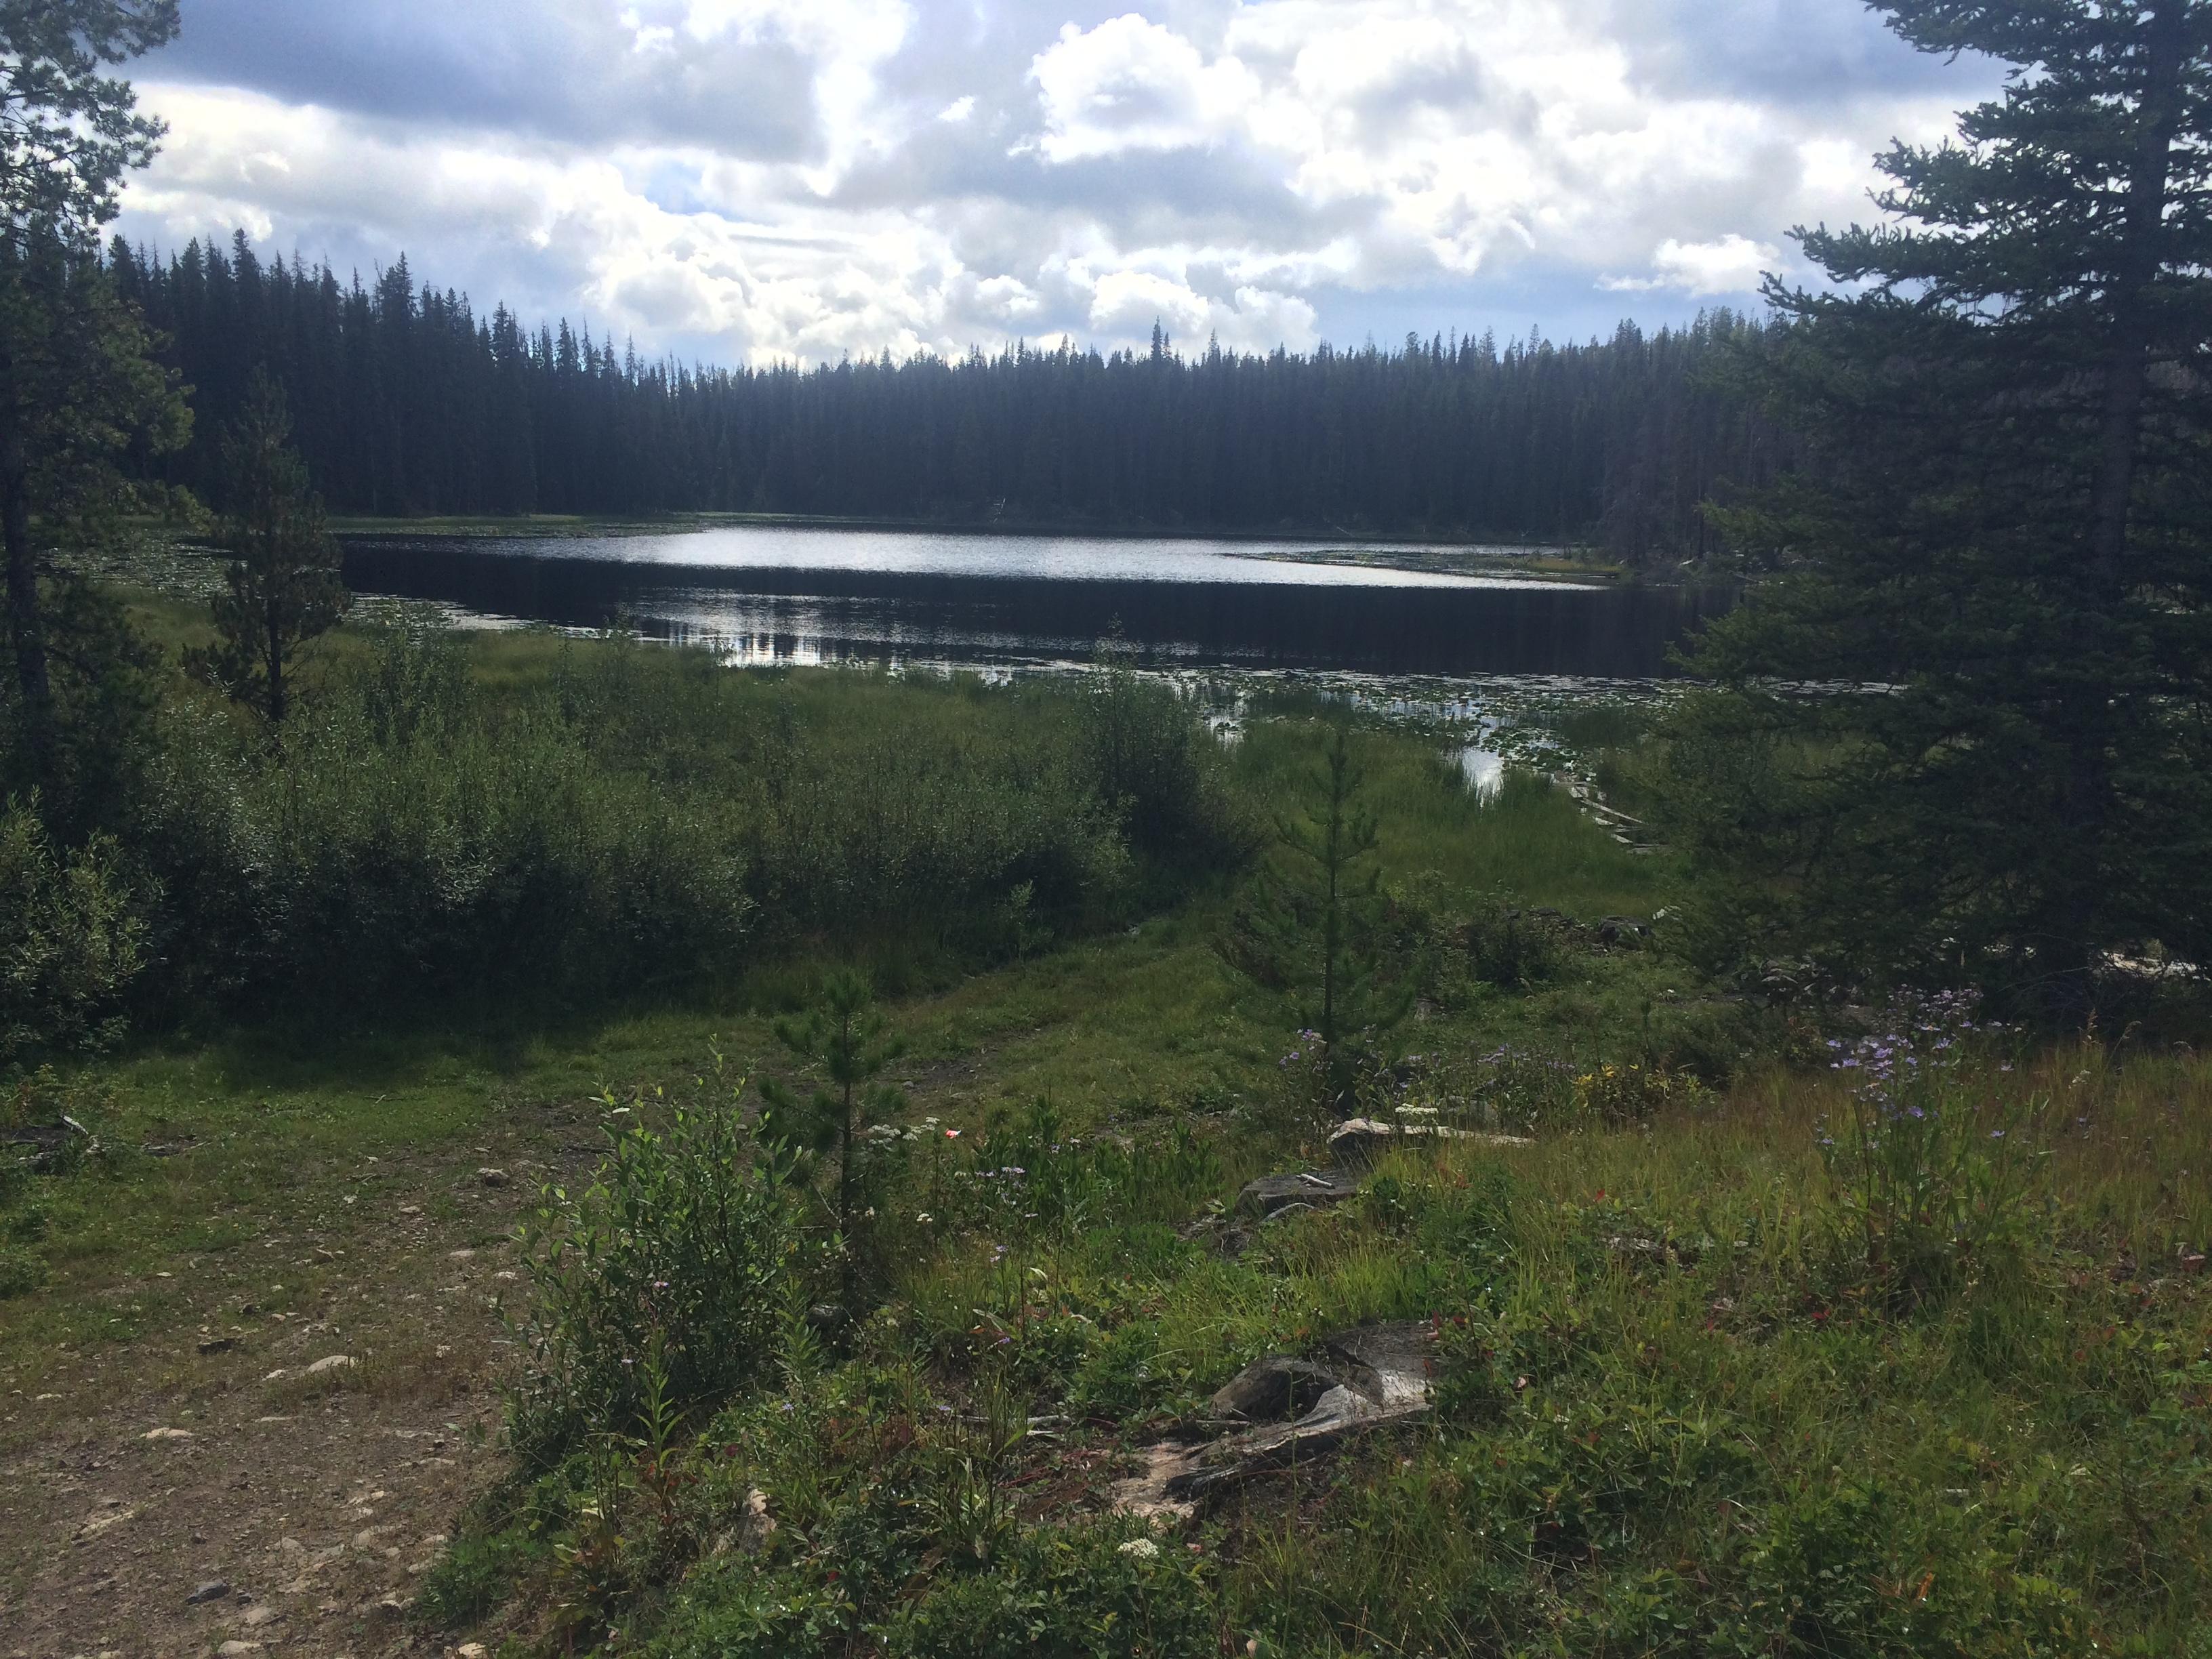 Kaiser Bill Lake